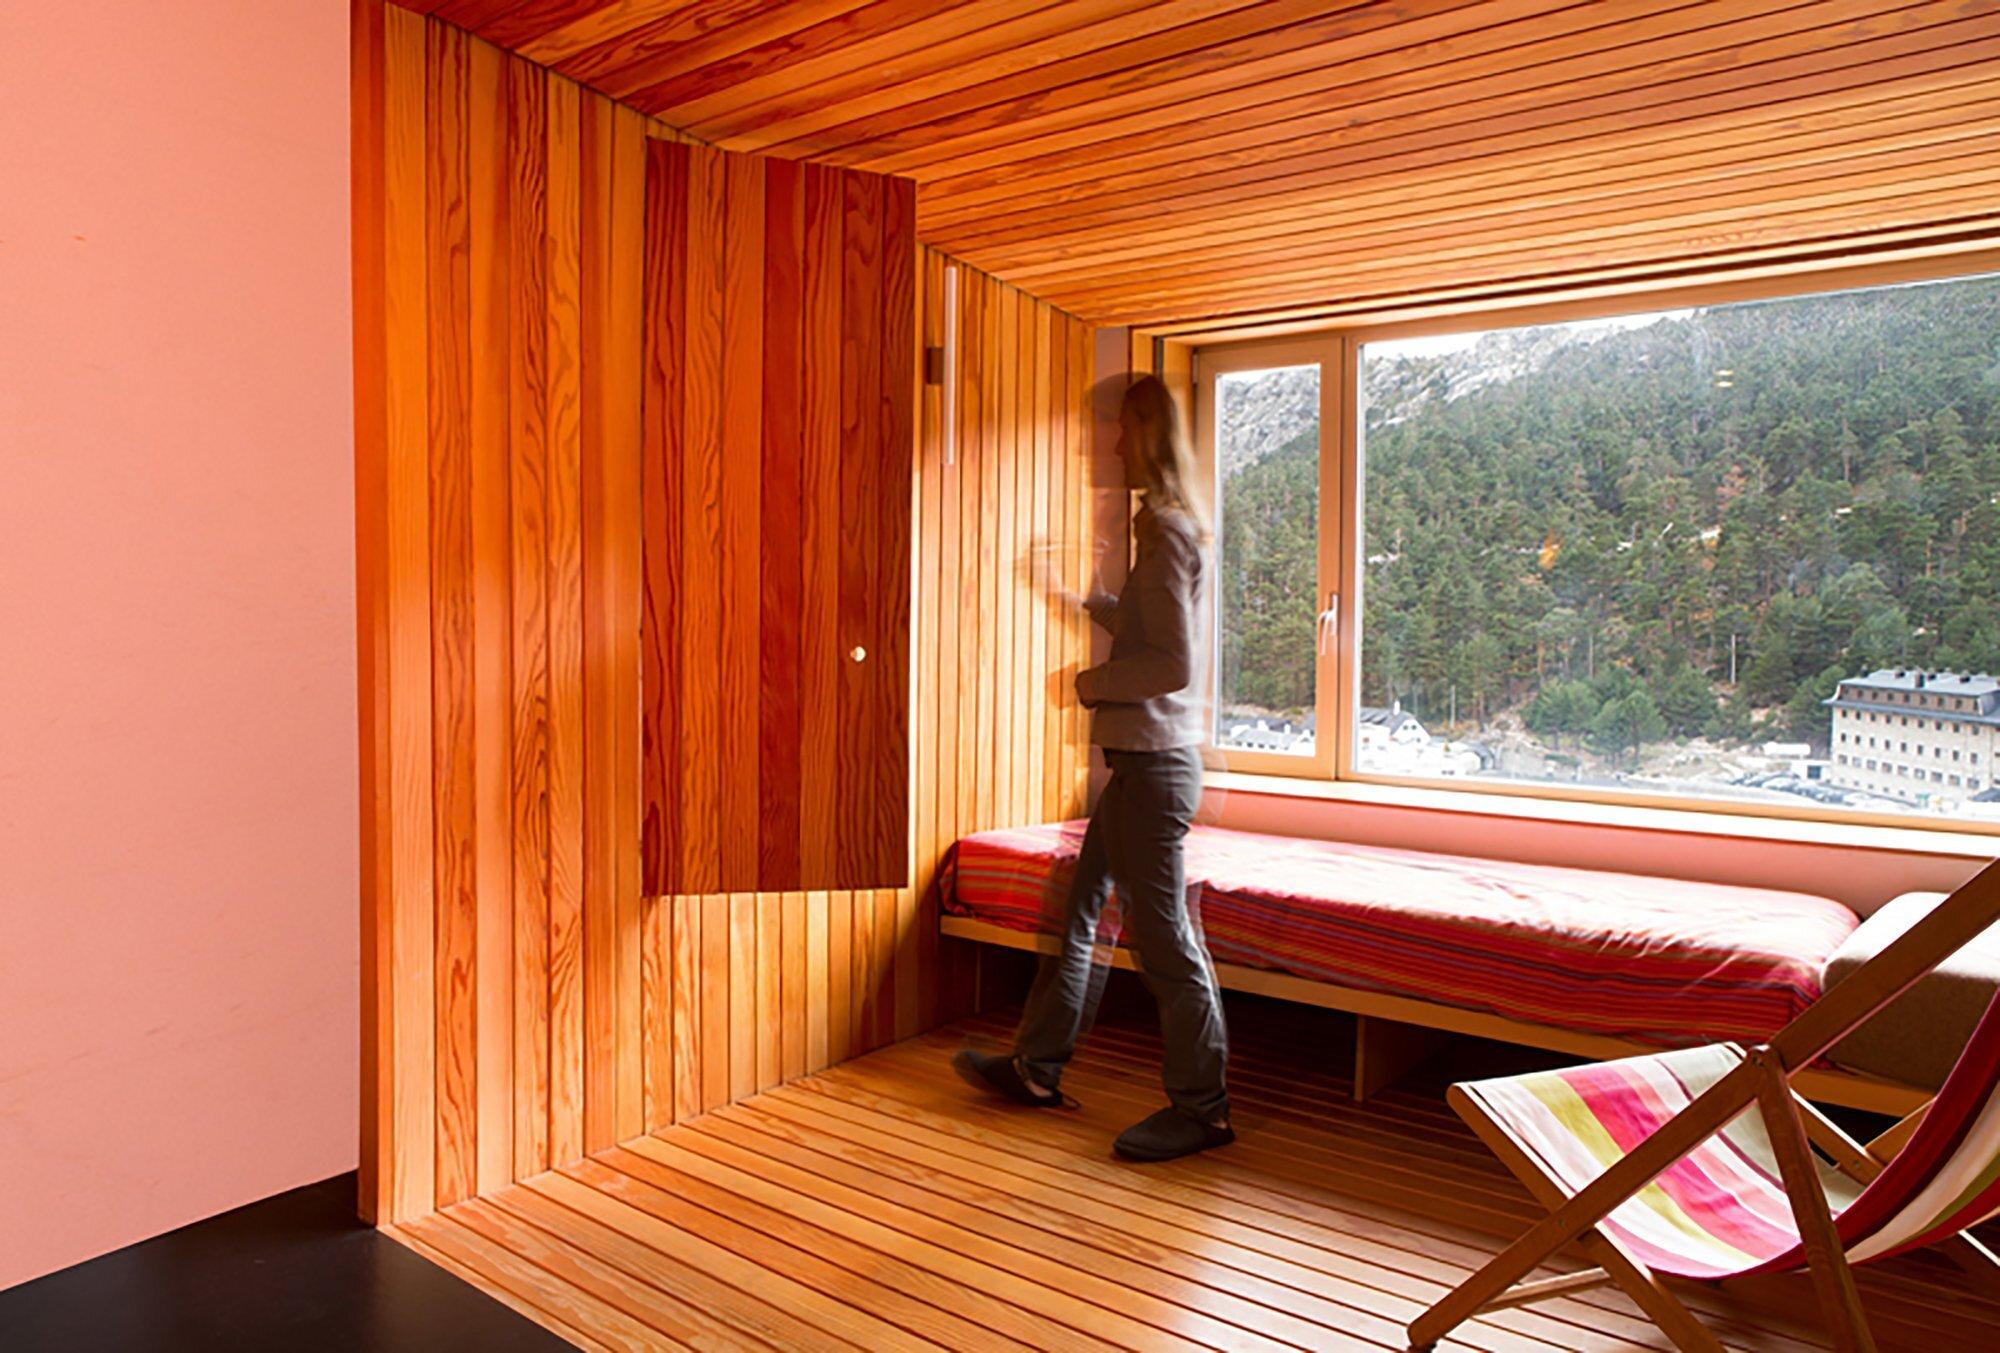 Studio in a Mountain Resort - Beriot Bernardini Arquitectos - Madrid Spain - Storage and Picture Window - Humble Homes